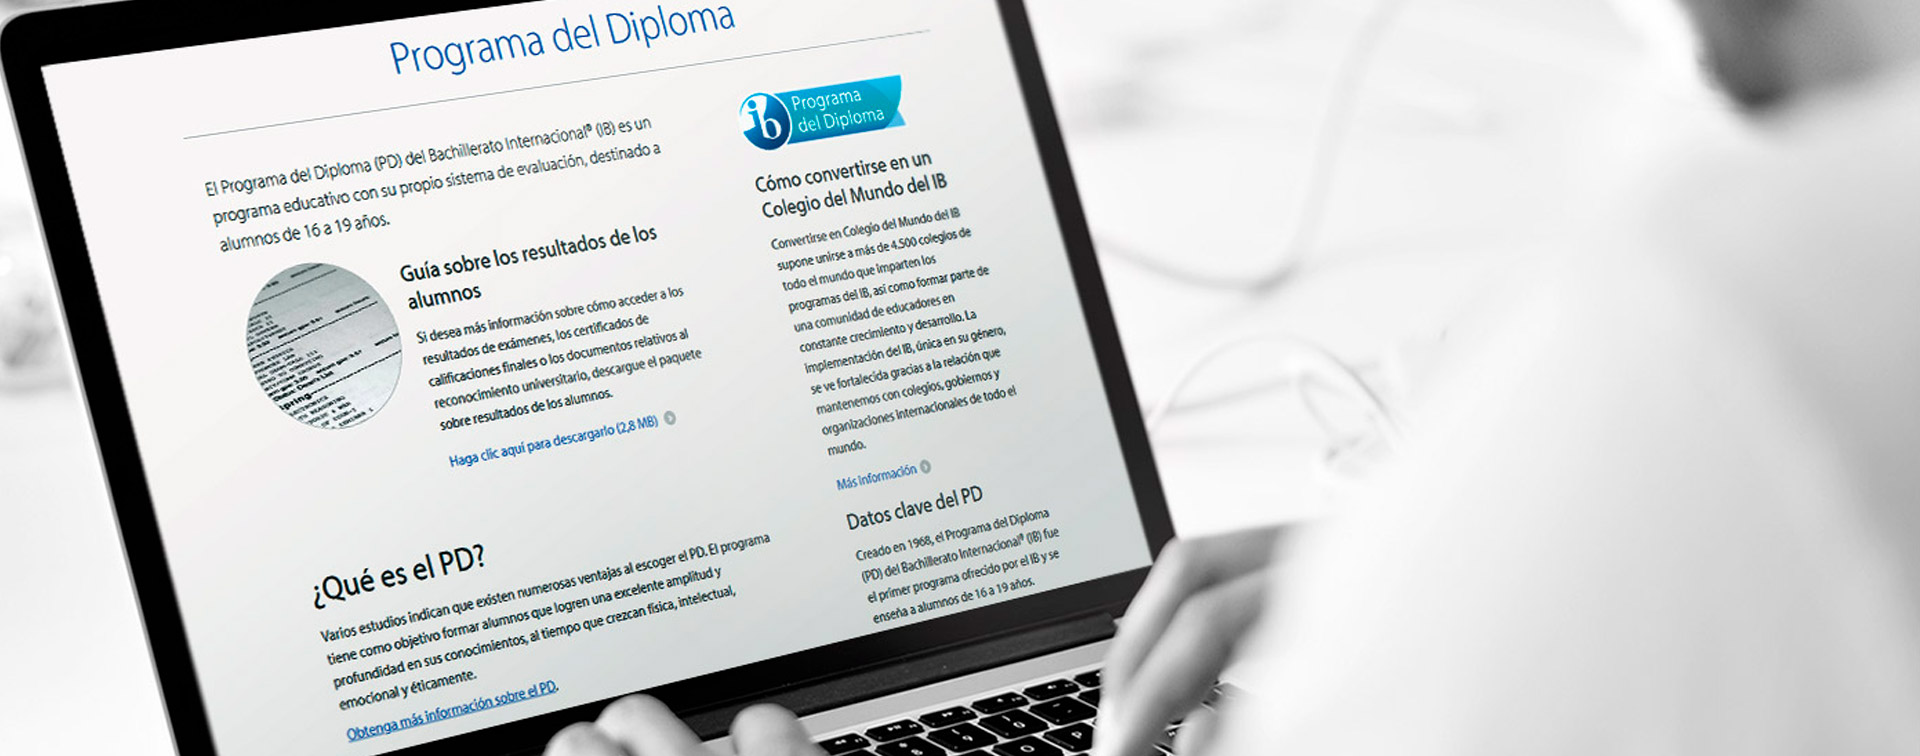 Sitio web oficial del Bachillerato Internacional